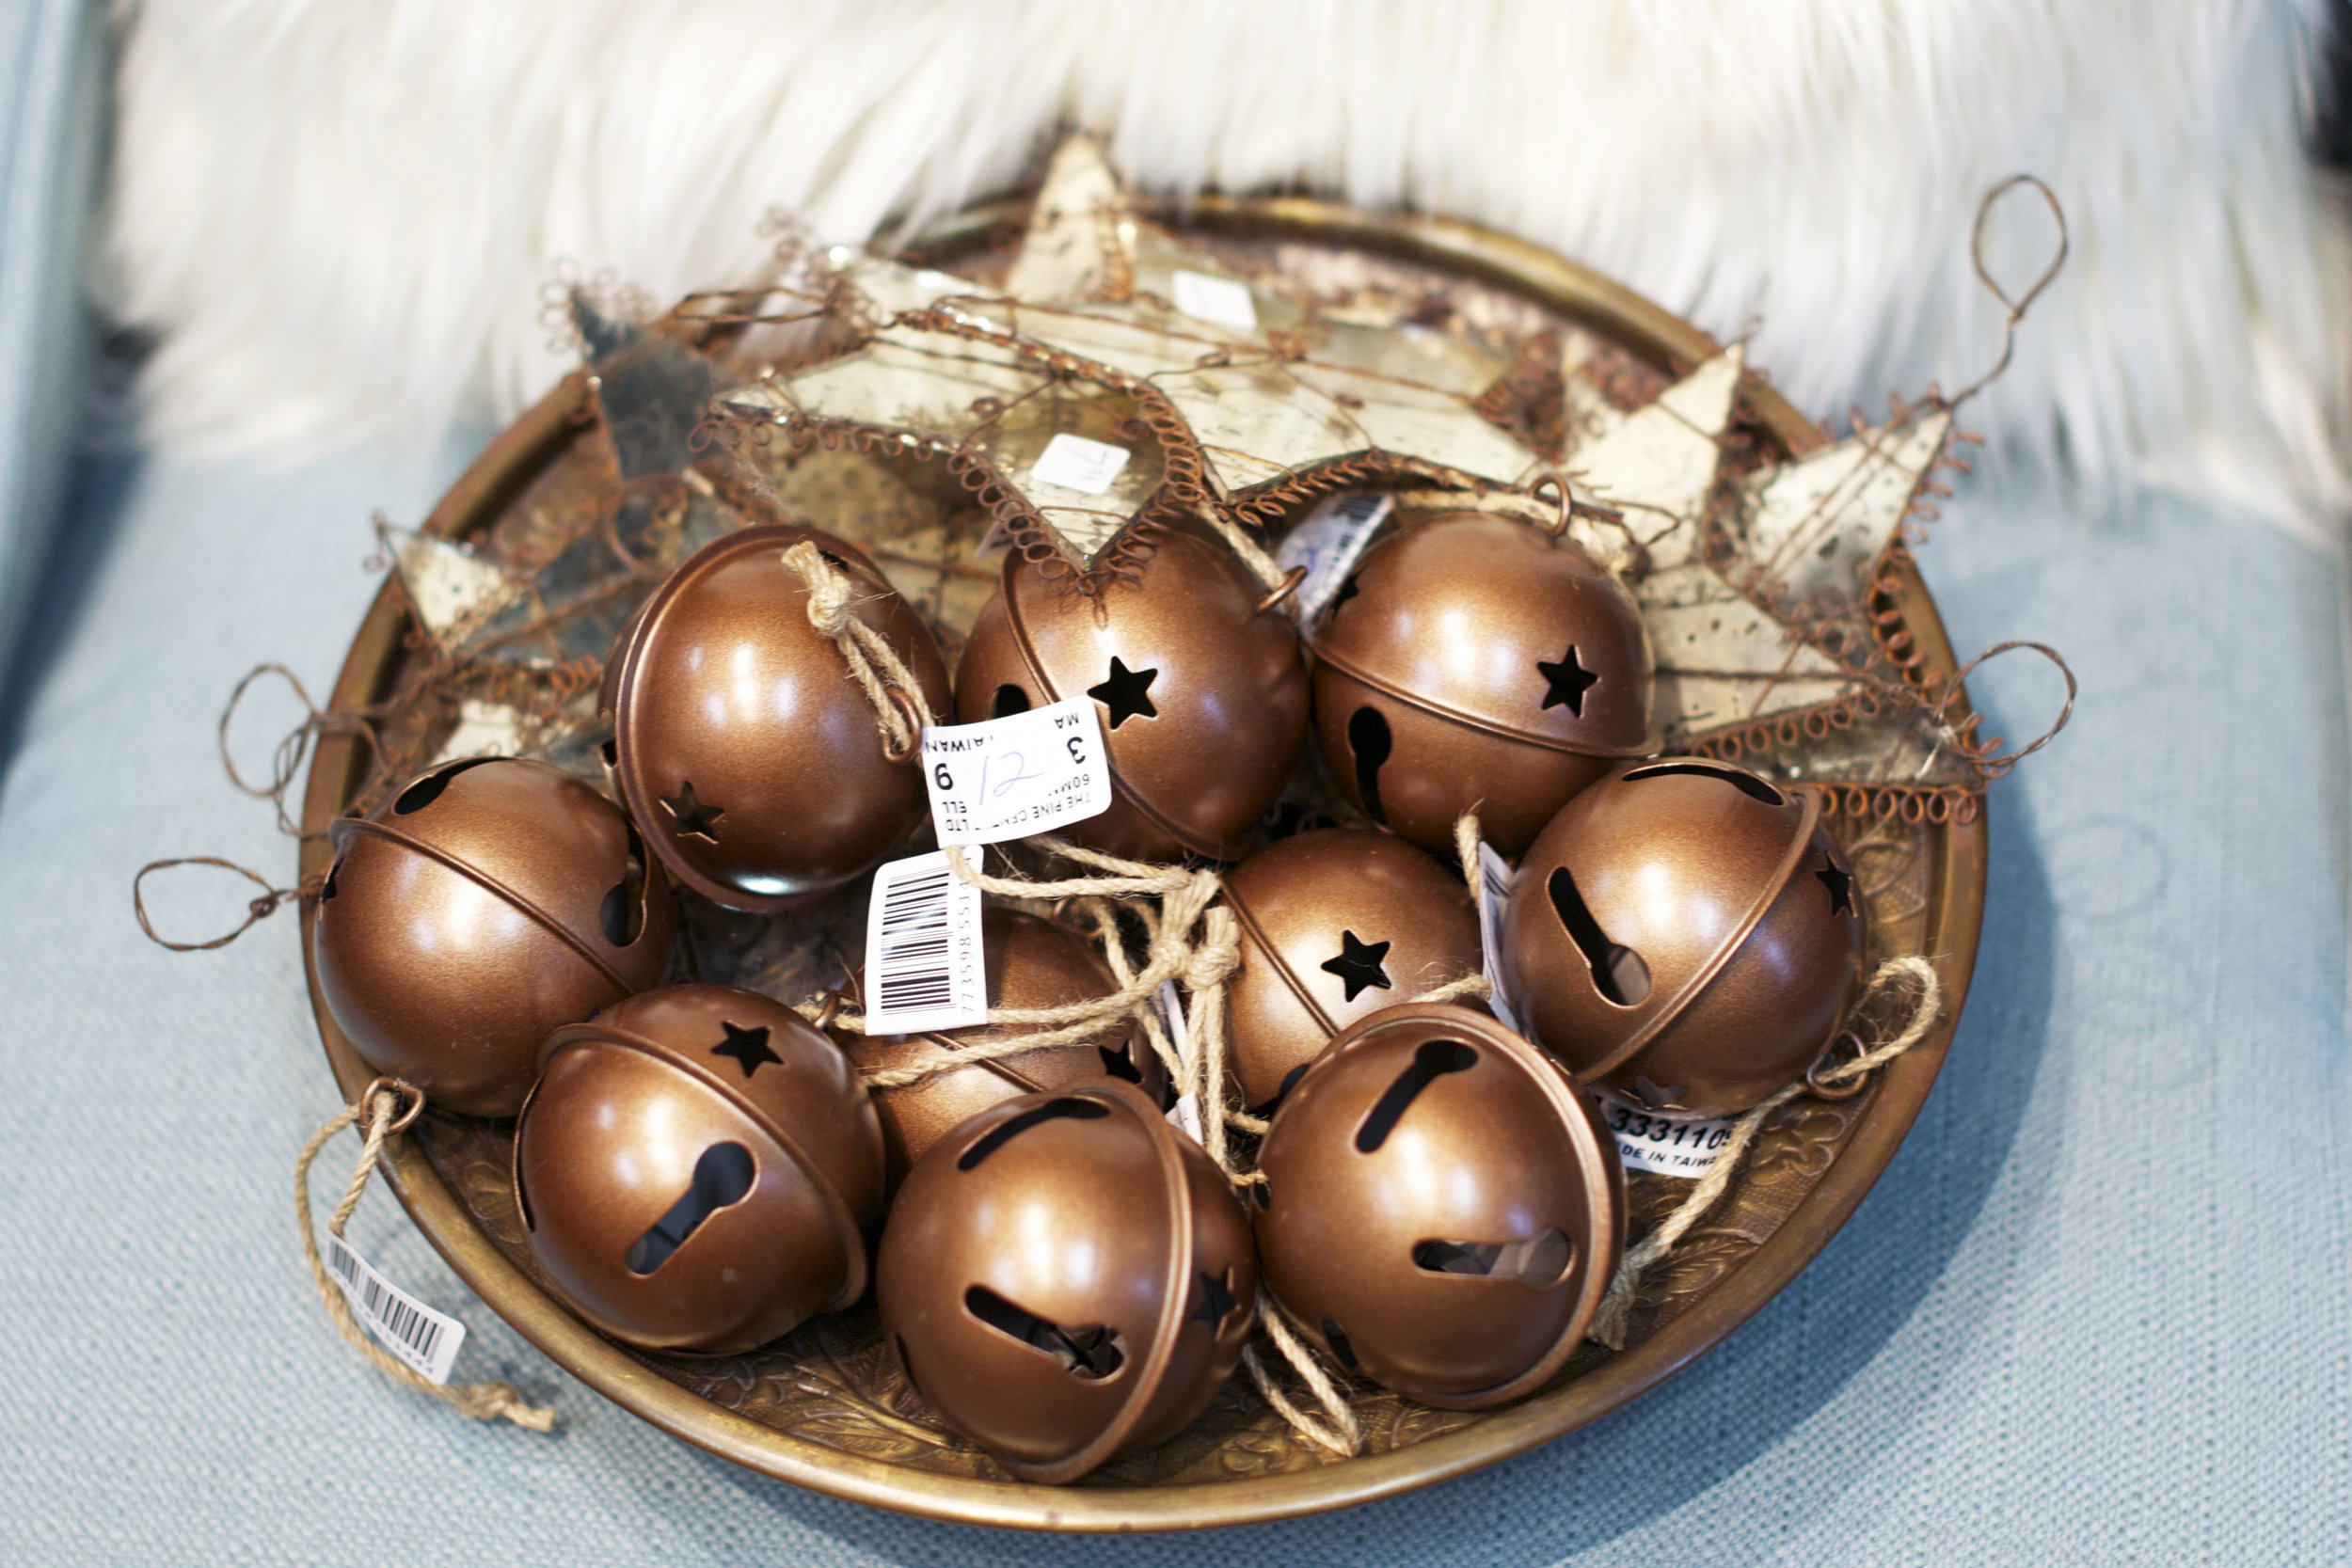 jingle-bells-and-stars-basket.jpg